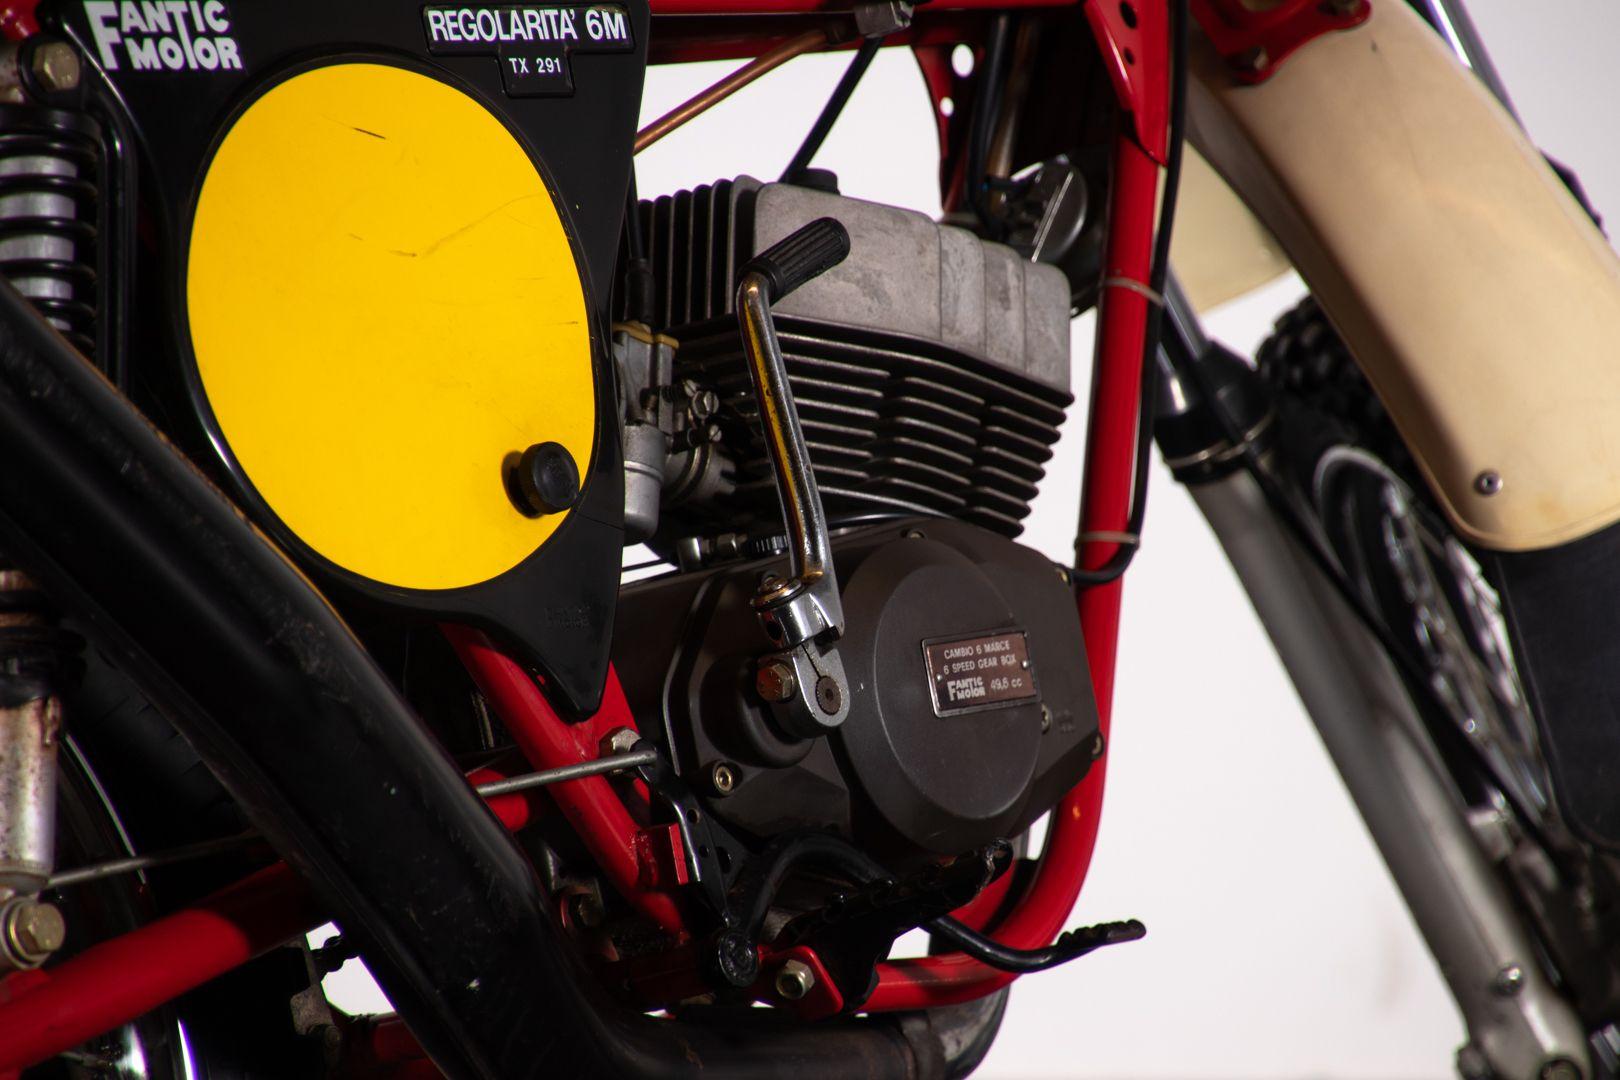 1979 FANTIC MOTOR TX 291 49341